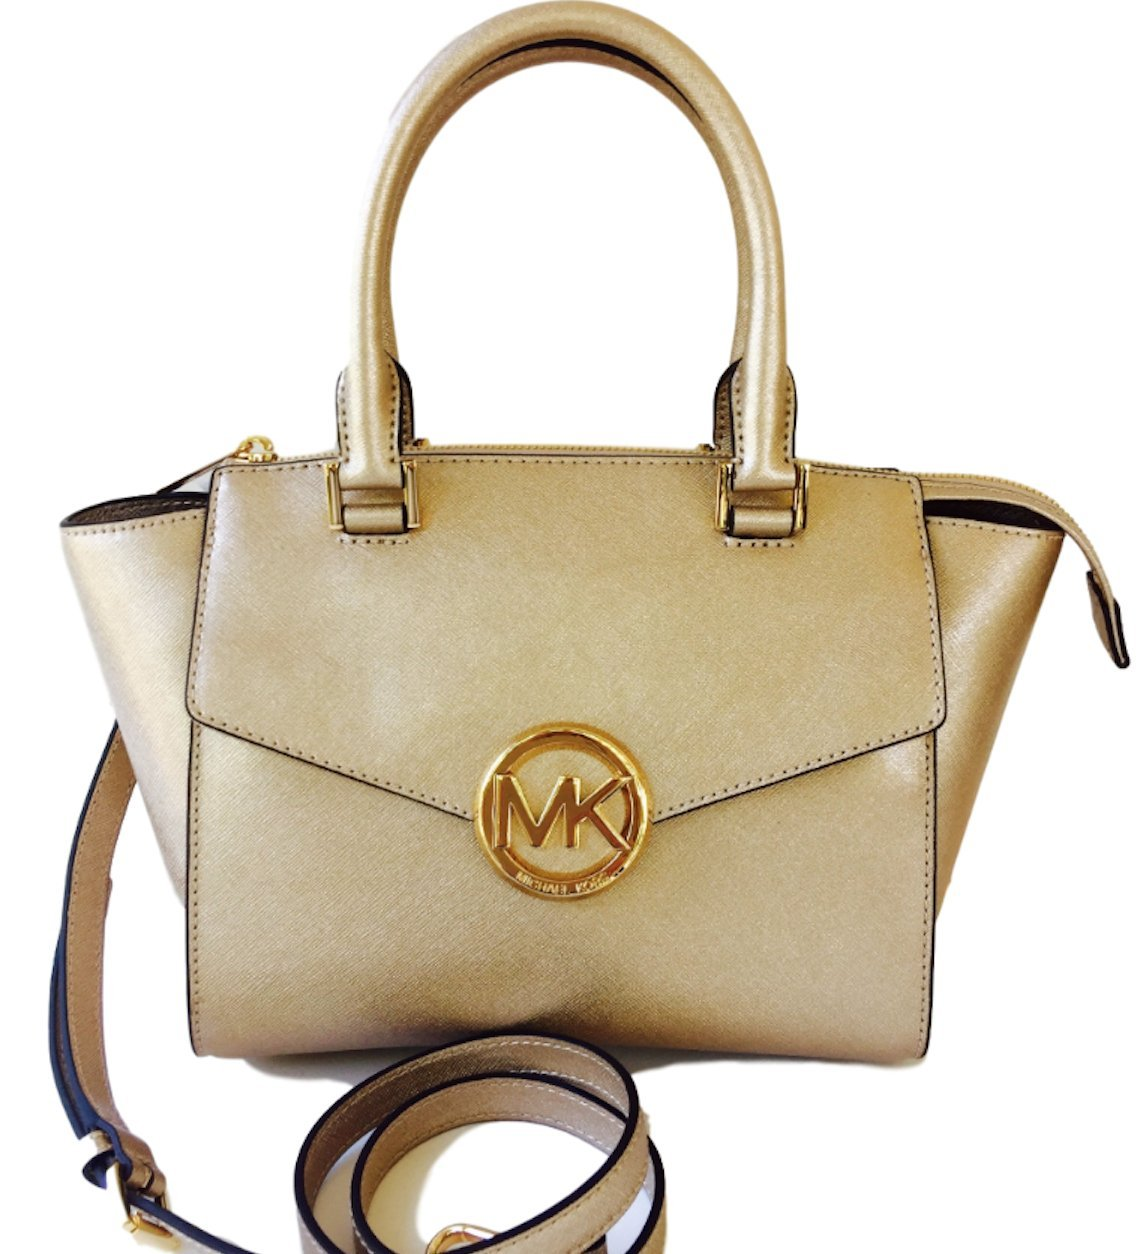 Michael Kors Hudson Medium Satchel in Saffiano Leather in Beautiful Pale Gold